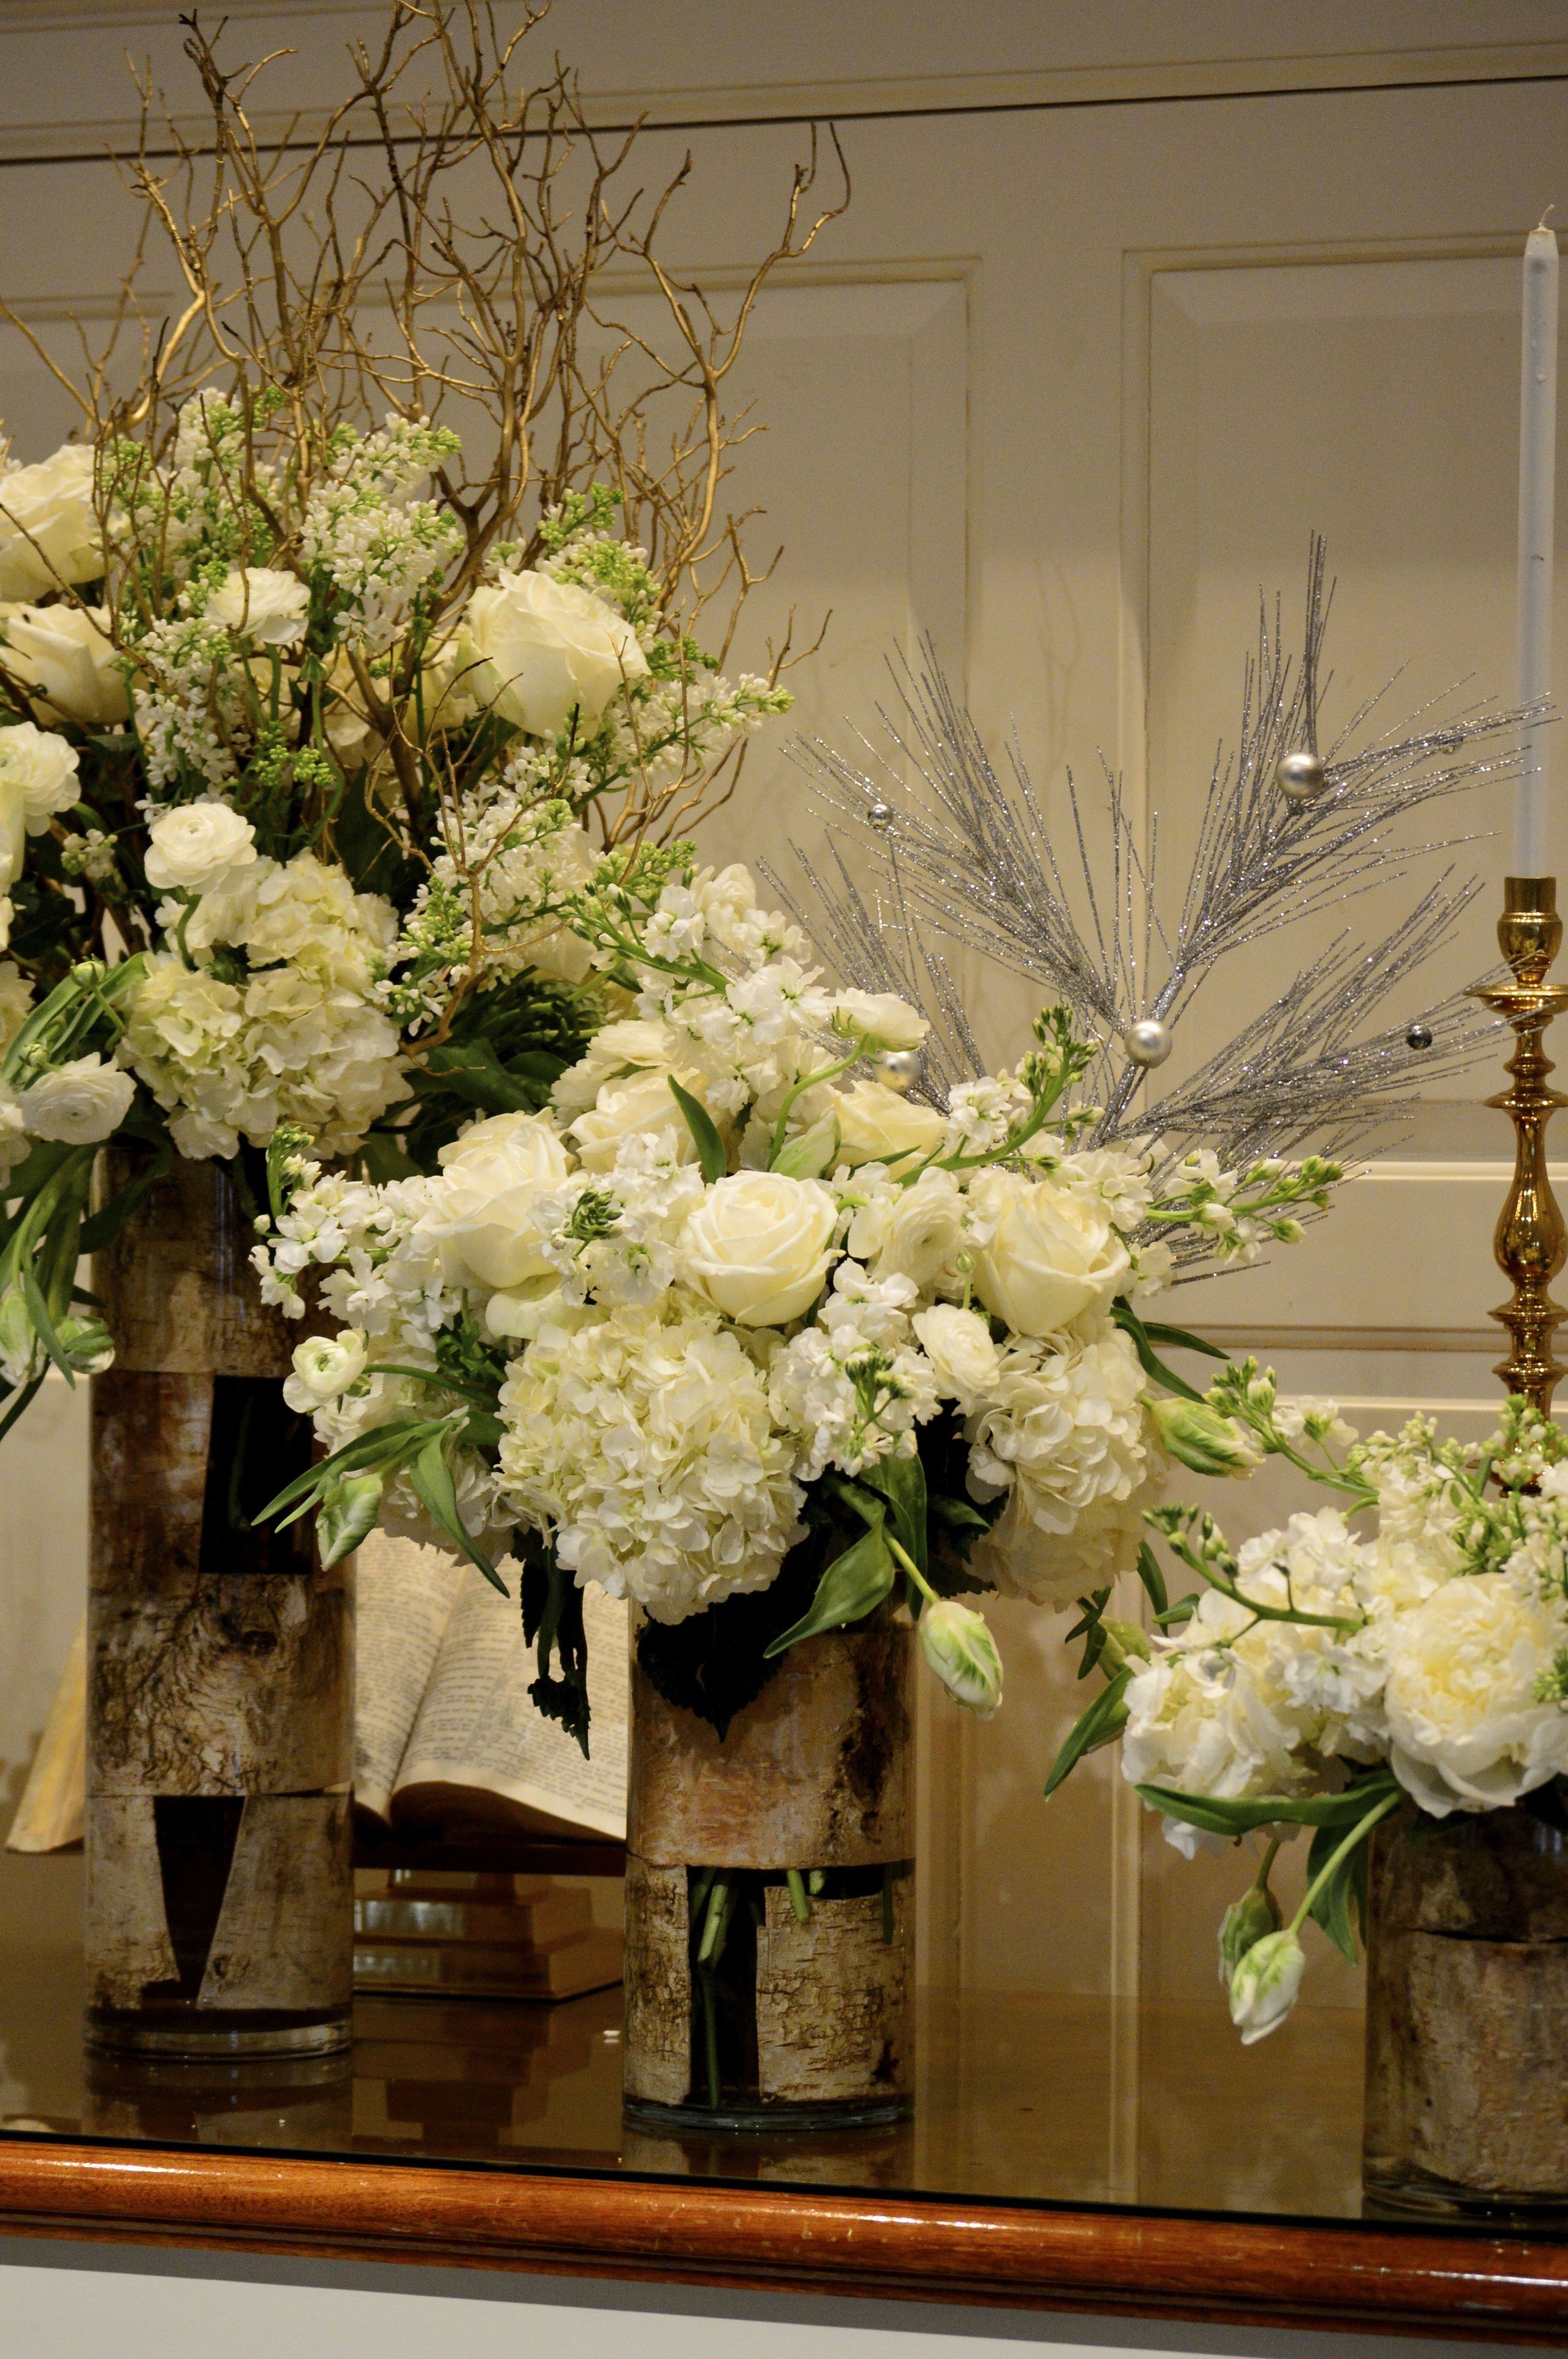 42 Beautiful Church Flower Arrangements For January Church Flower Arrangements Beautiful Flower Arrangements Flower Arrangements